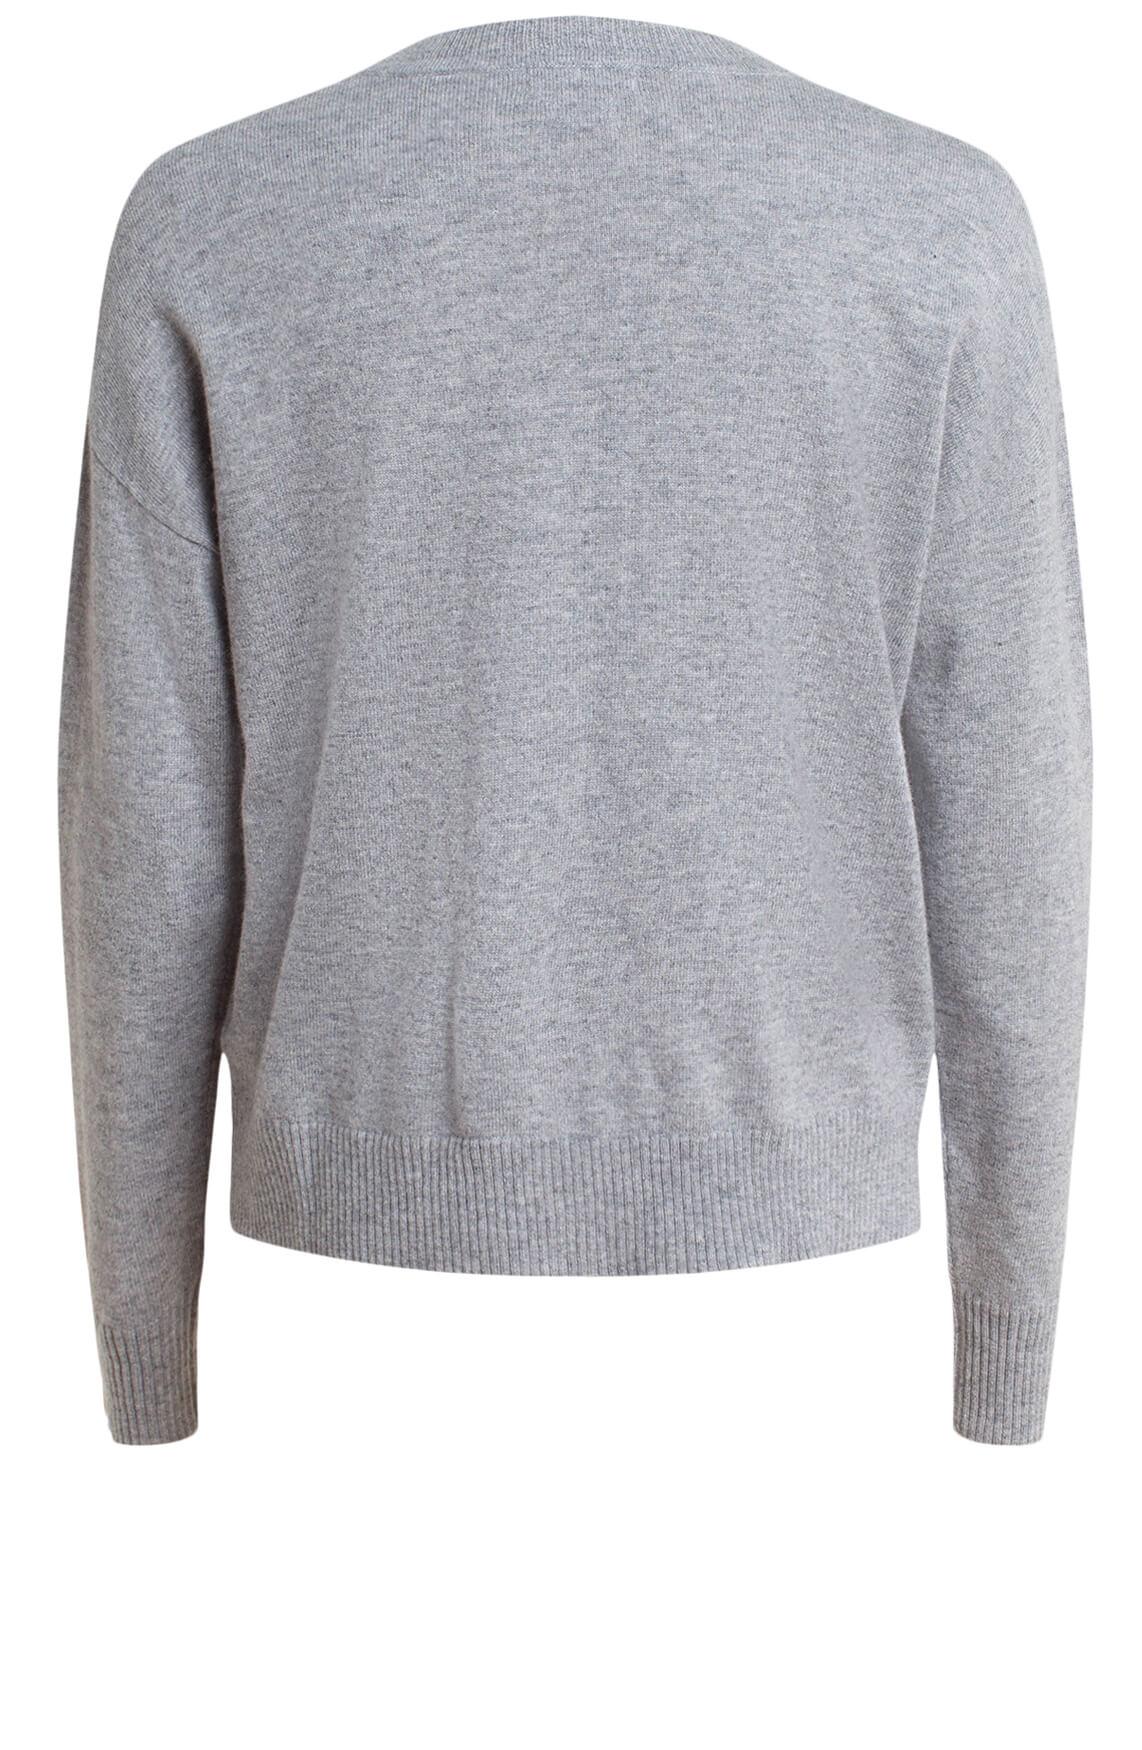 Anna Dames Cashmere pullover Grijs